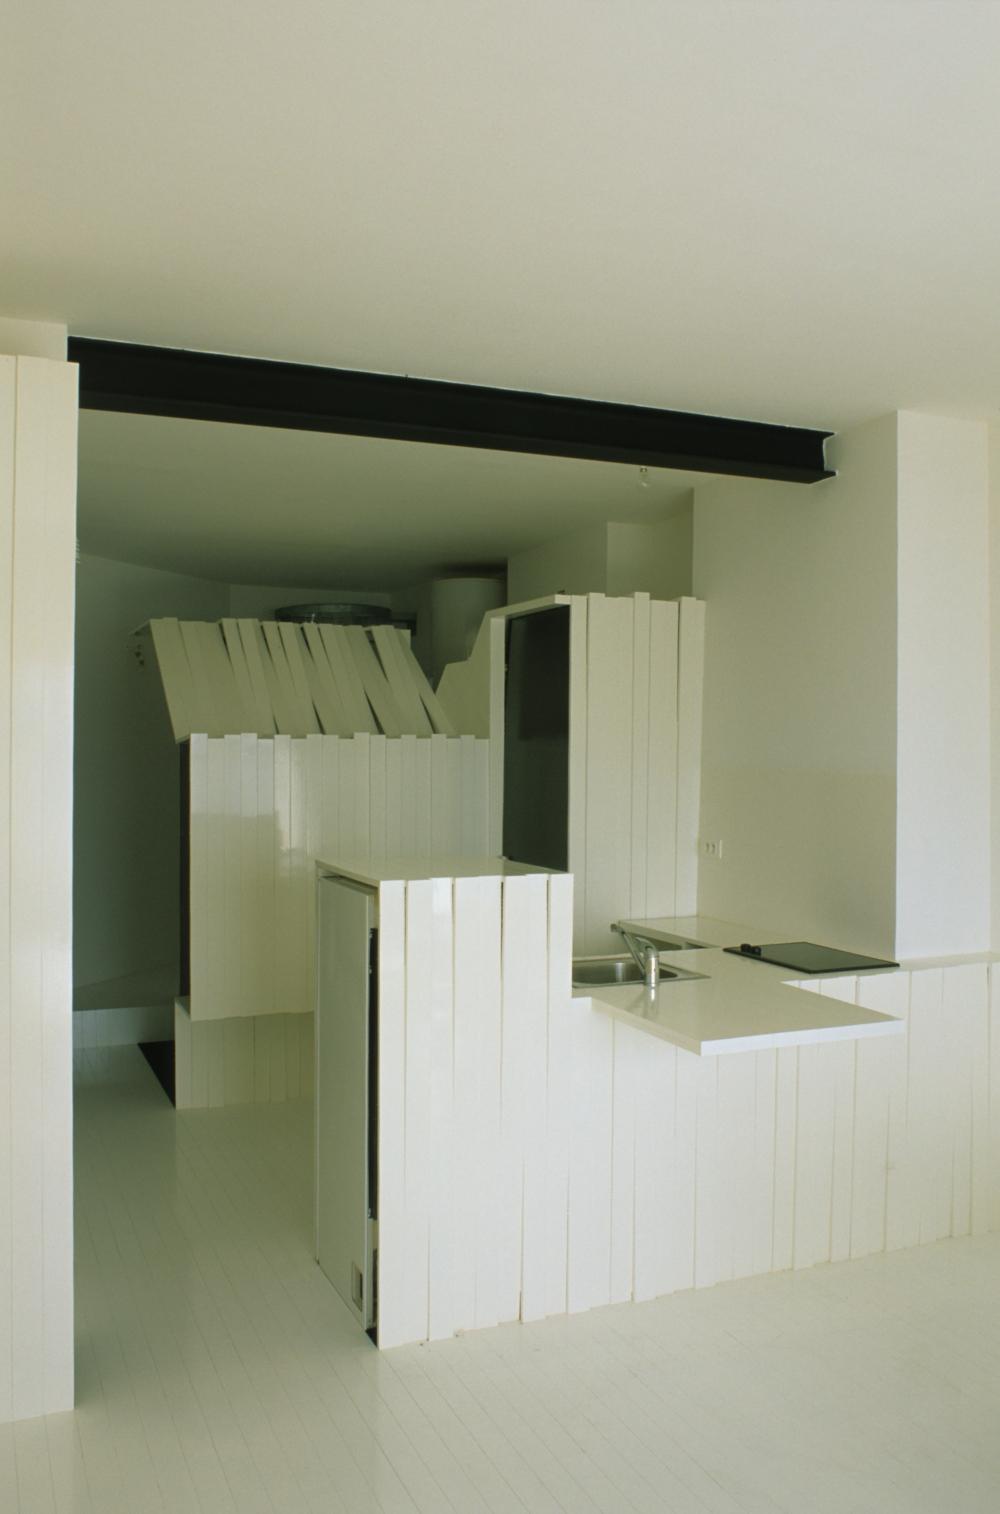 habitat individuel avignon clouet architectes page 3. Black Bedroom Furniture Sets. Home Design Ideas